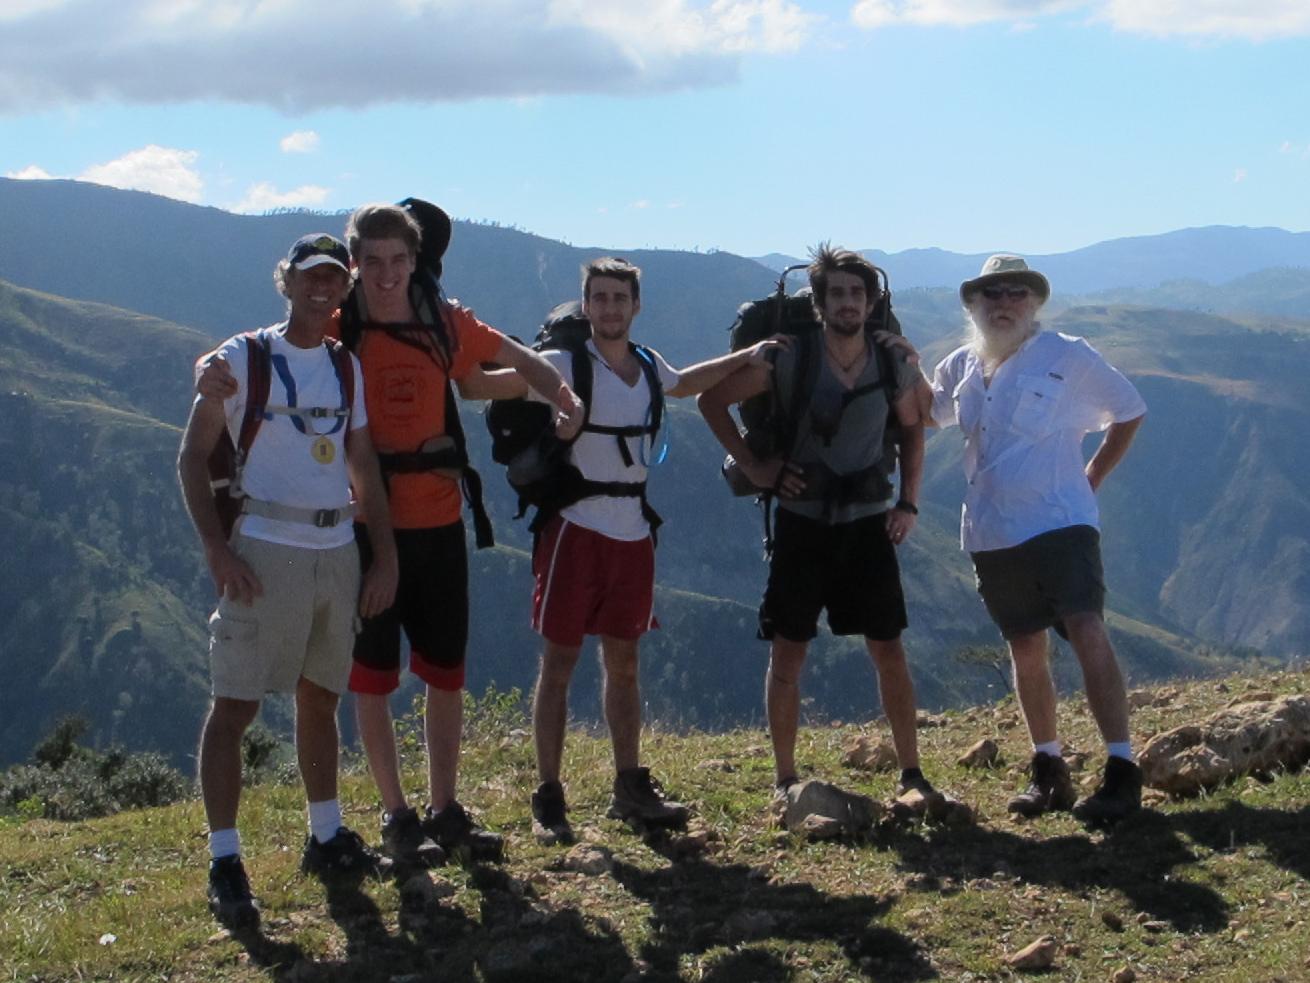 Adventurers on the way to Calalou